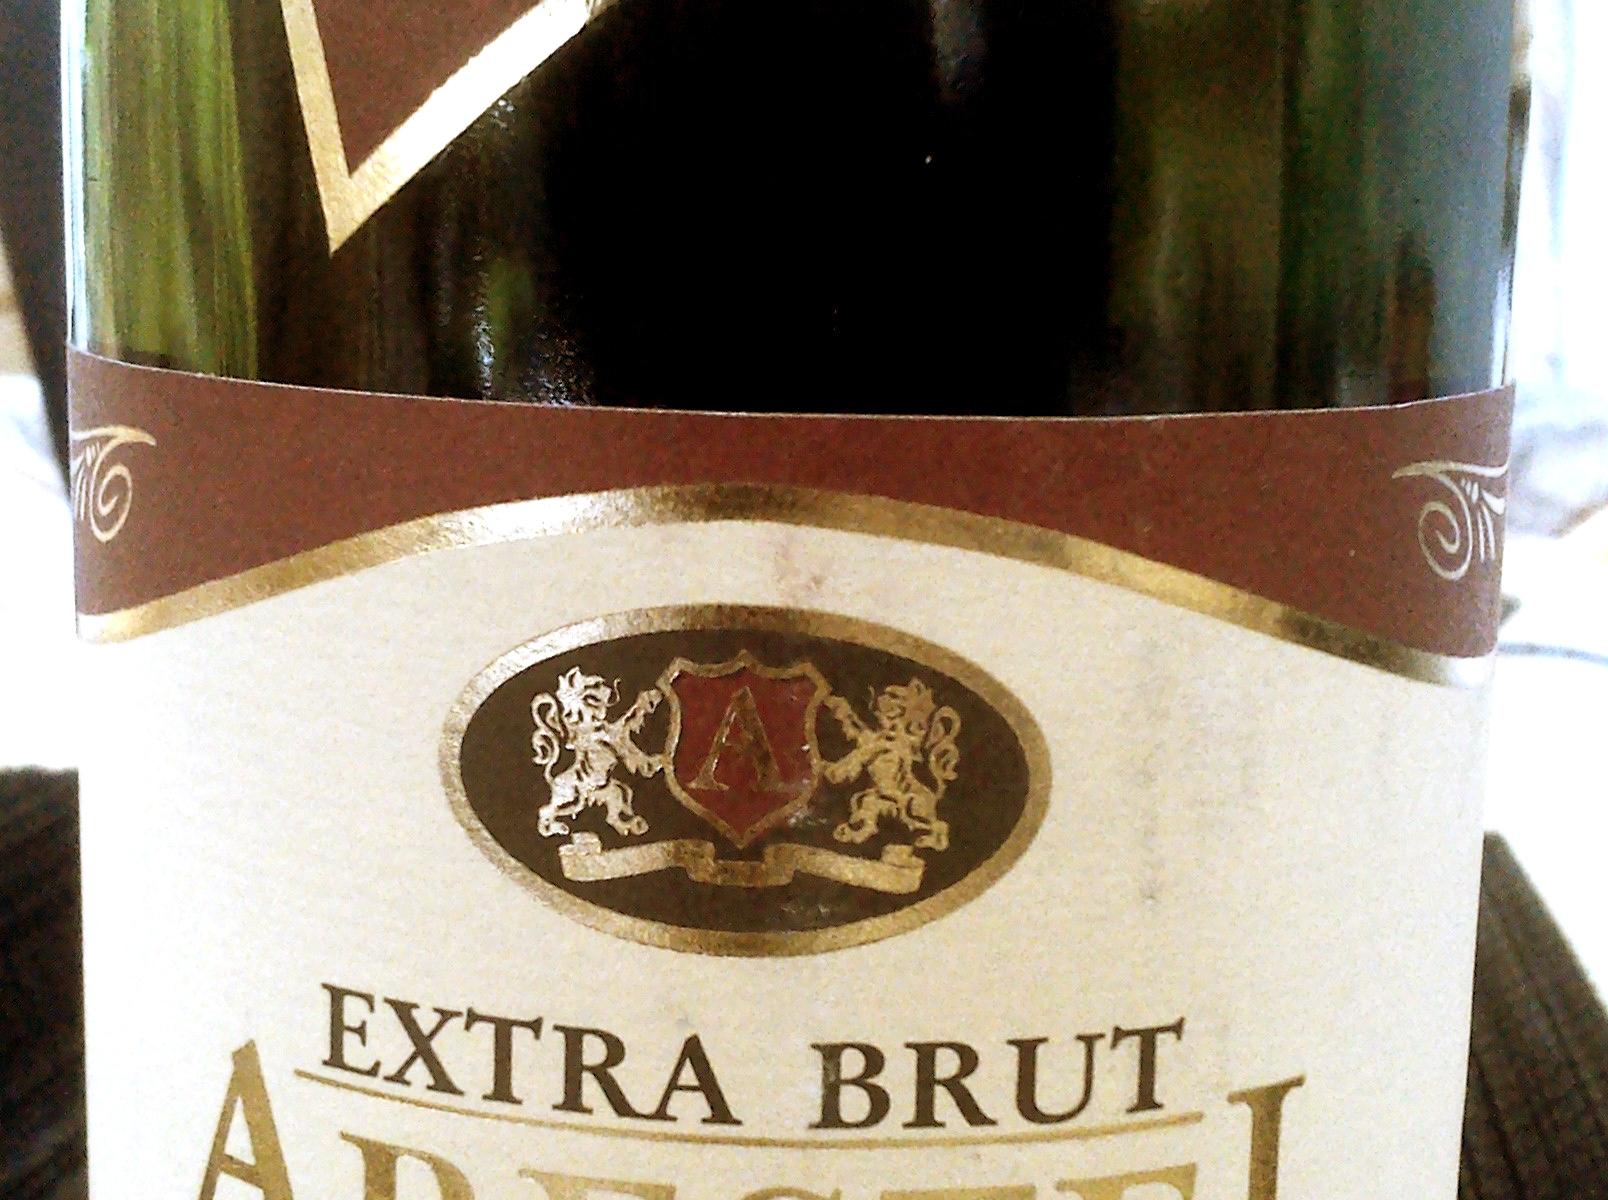 Arestel Cava Extra Brut Vintage 2011